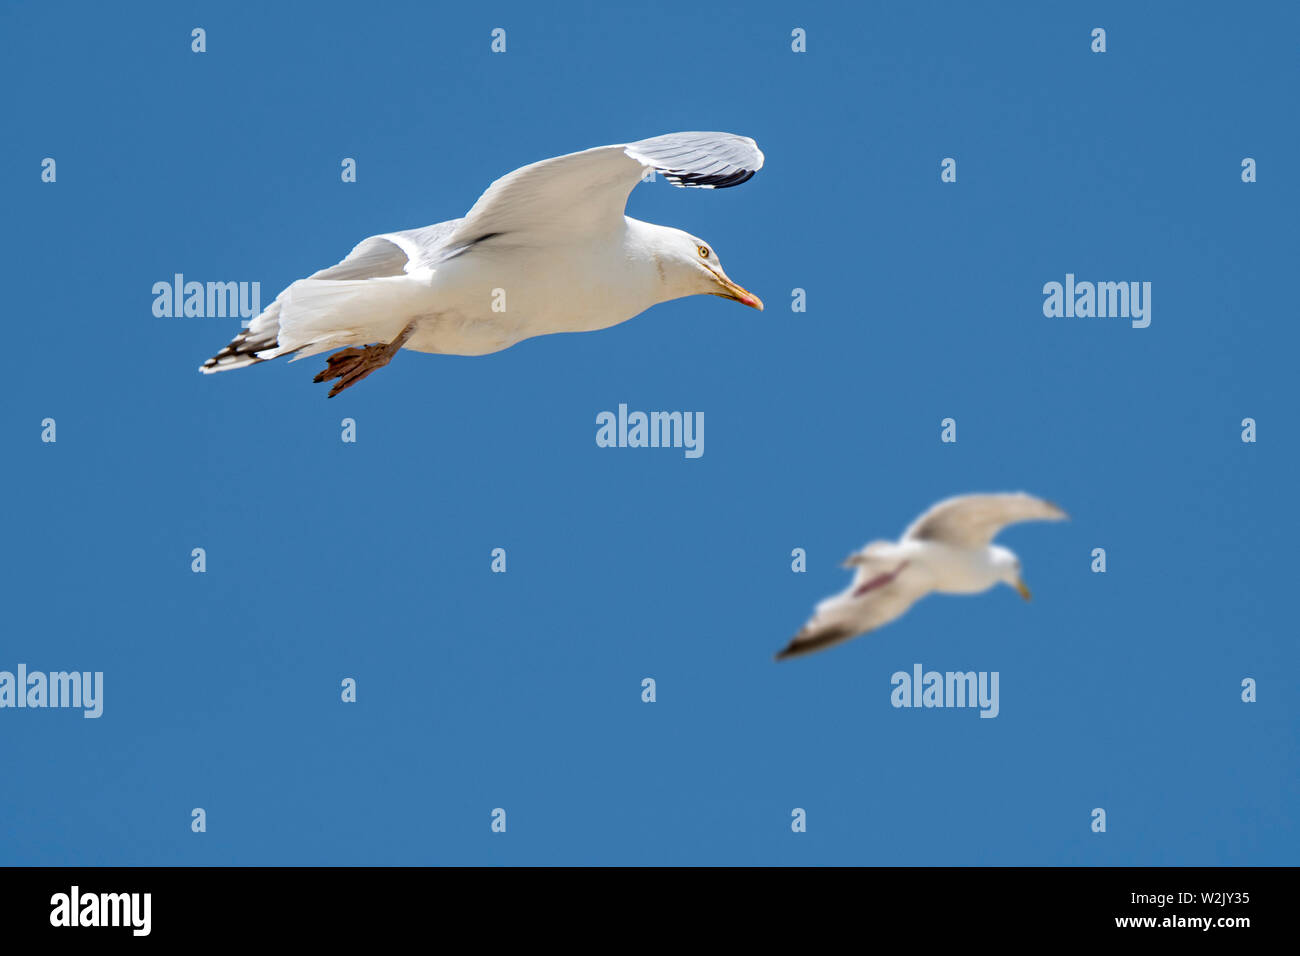 Two adult European herring gulls (Larus argentatus) in flight against blue sky - Stock Image